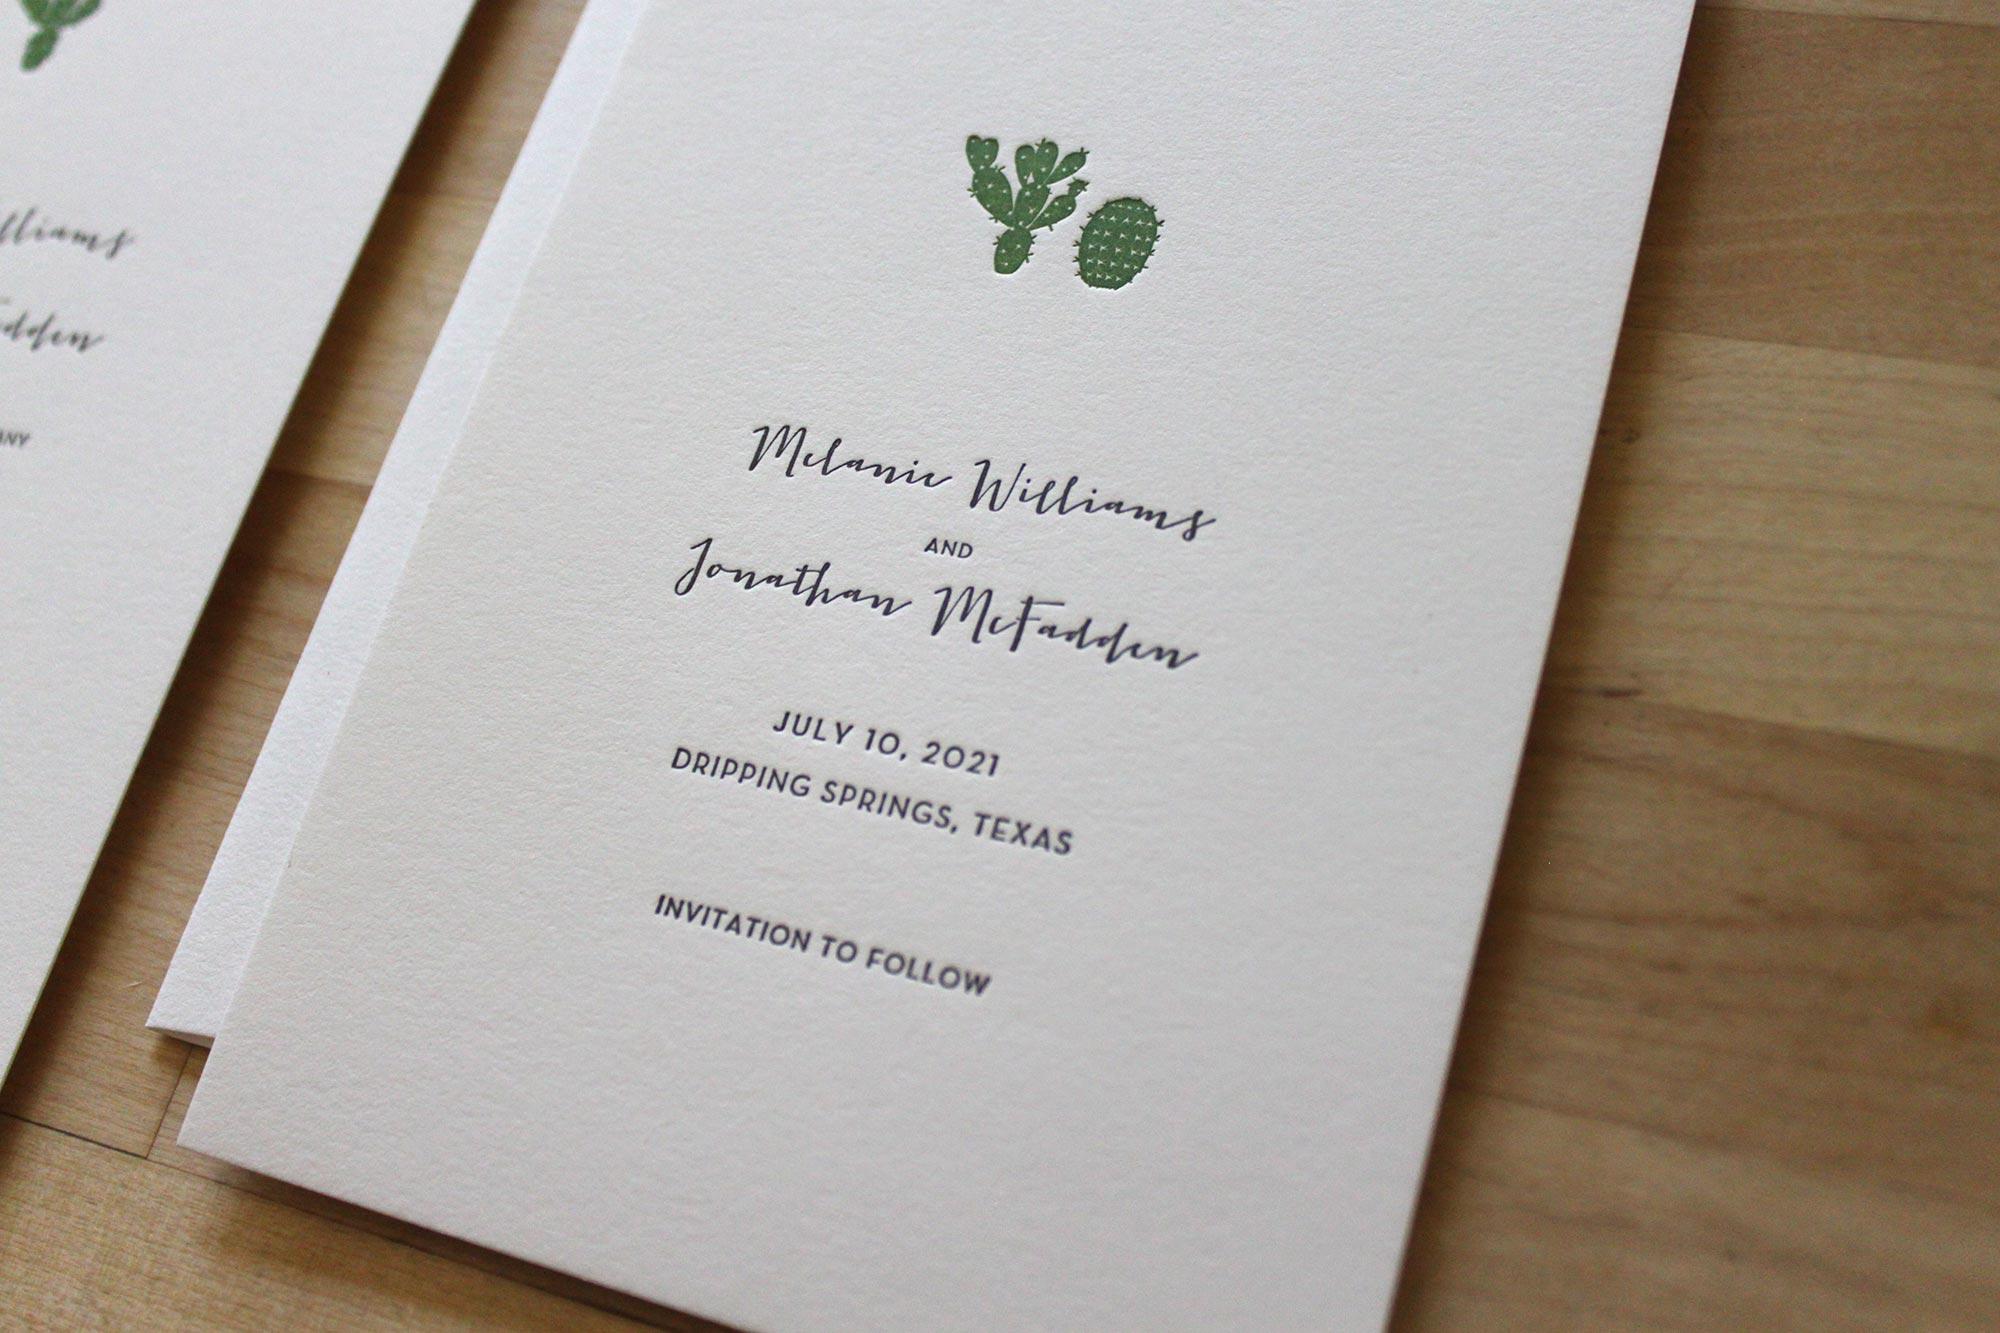 Cactus-6-letterpress-wedding-invitations.jpg